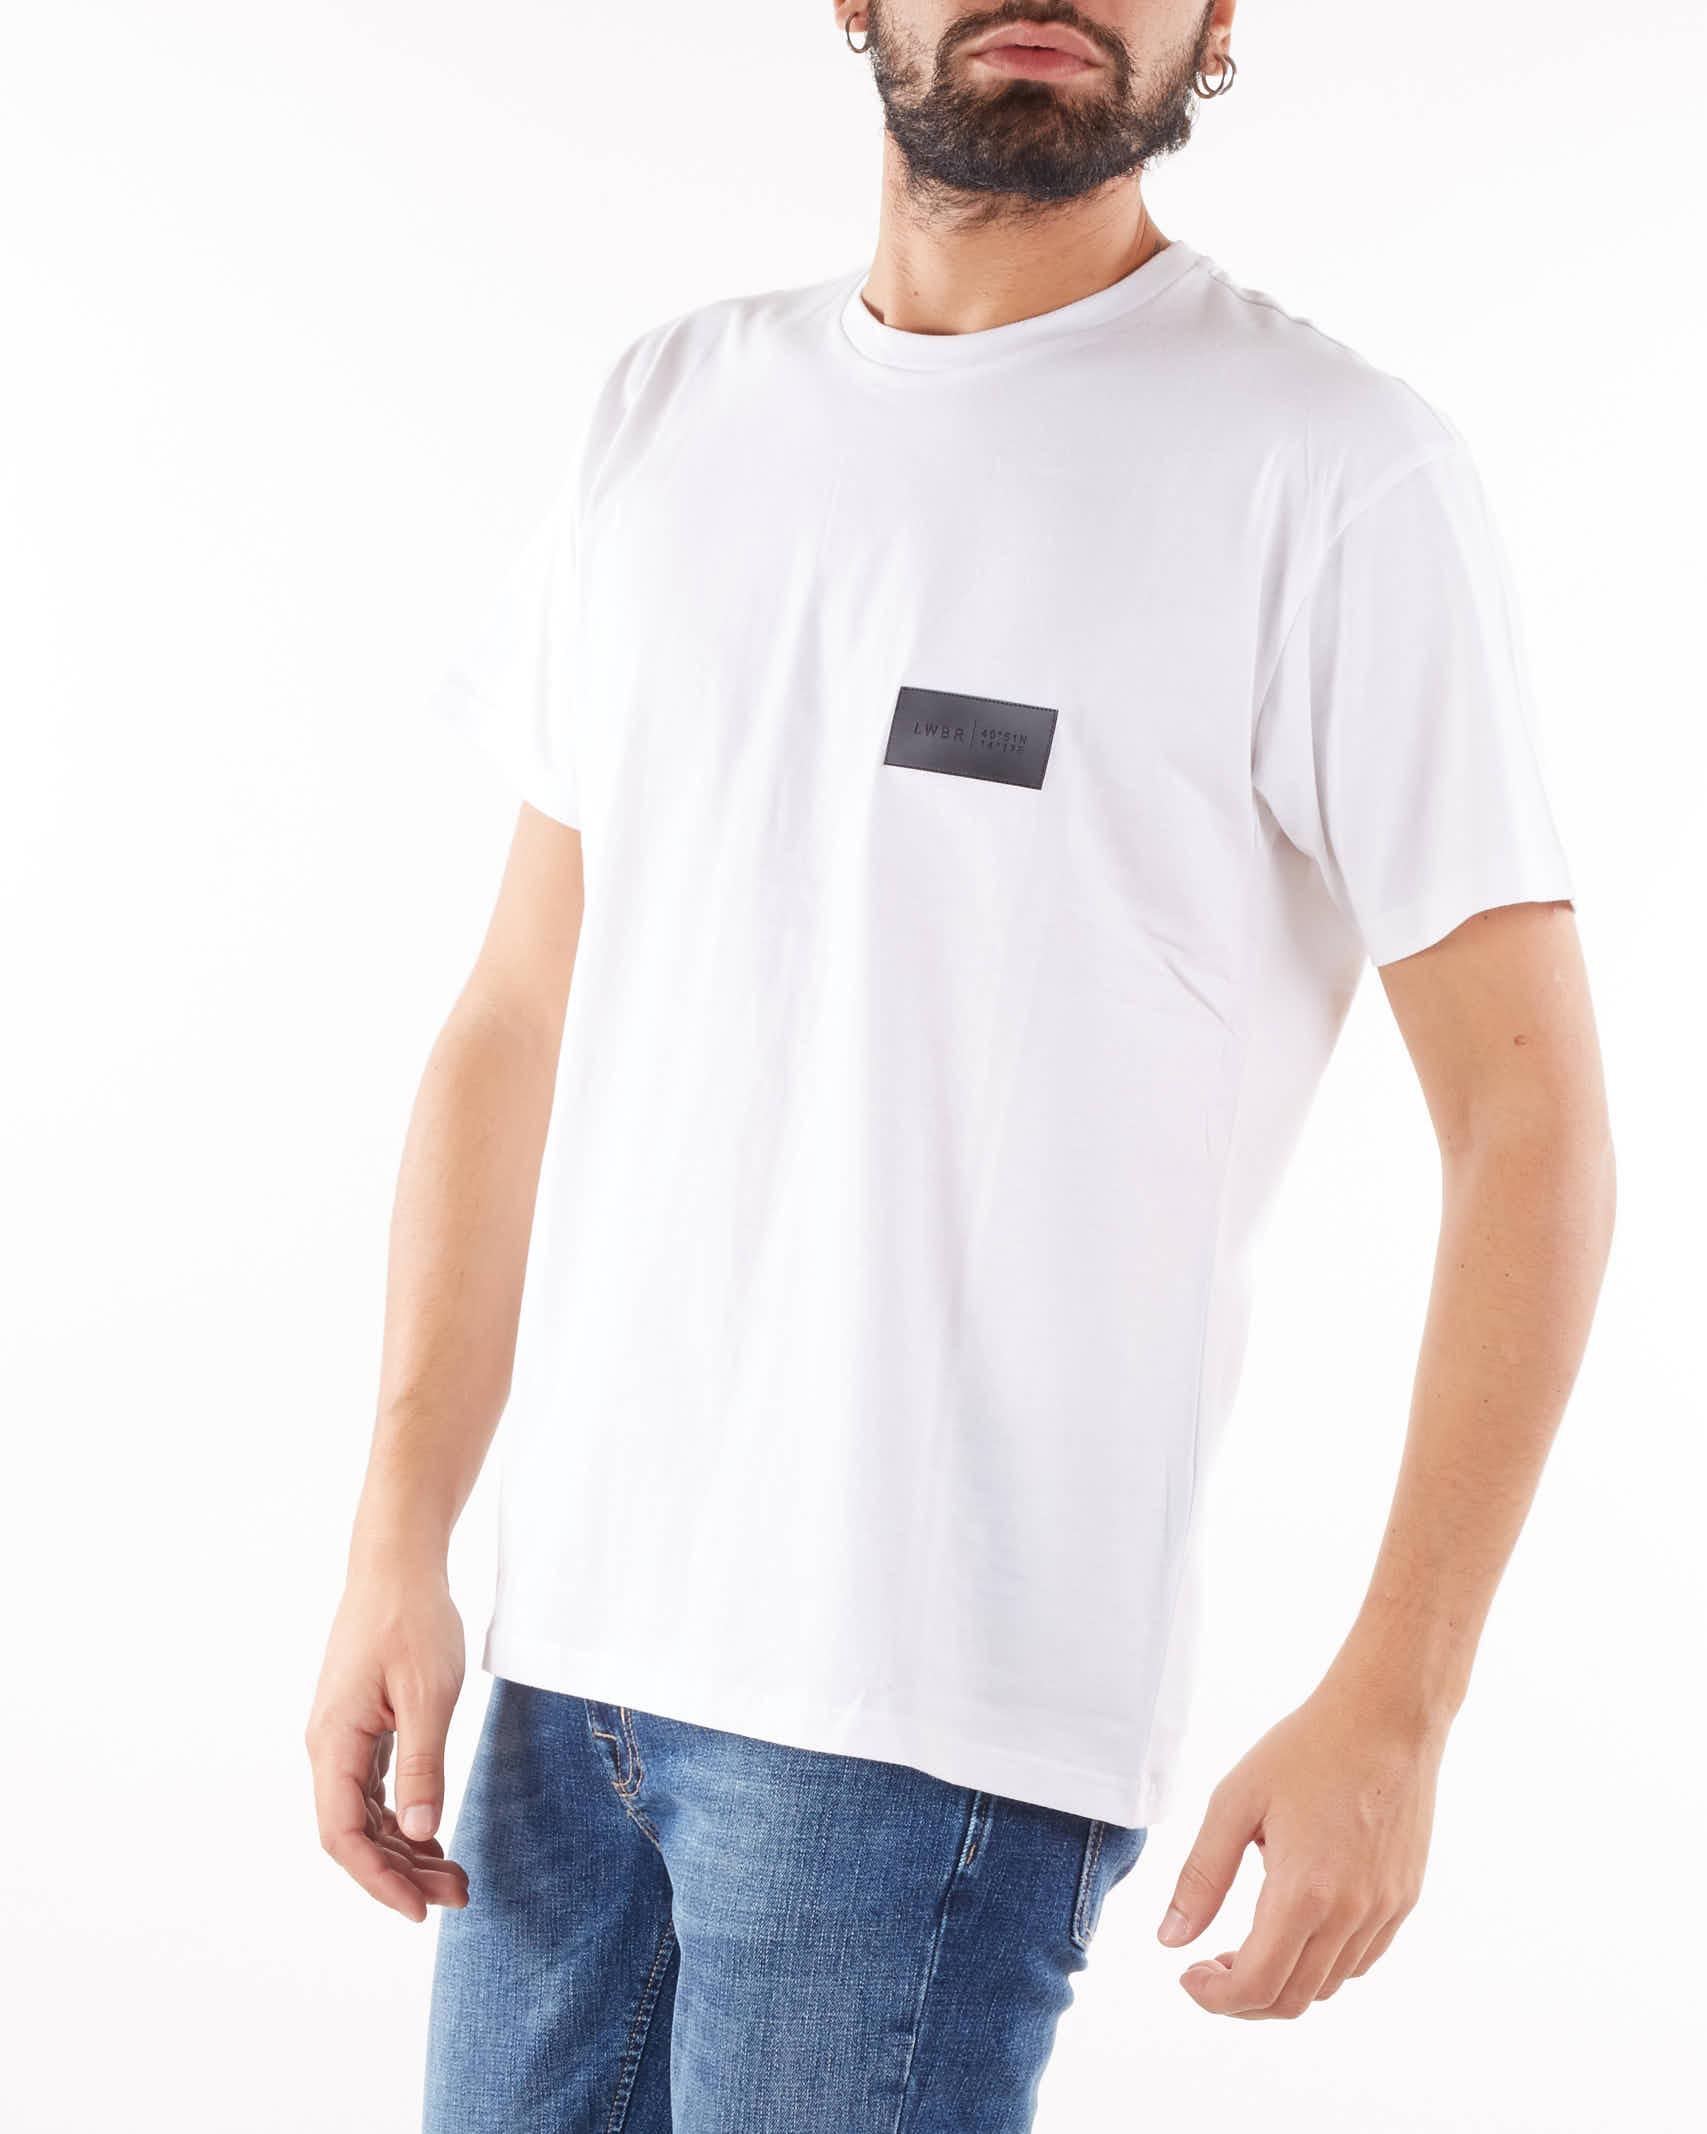 T-shirt con logo e stampa sul retro Low Brand LOW BRAND   T-shirt   L1TFW21225974A001